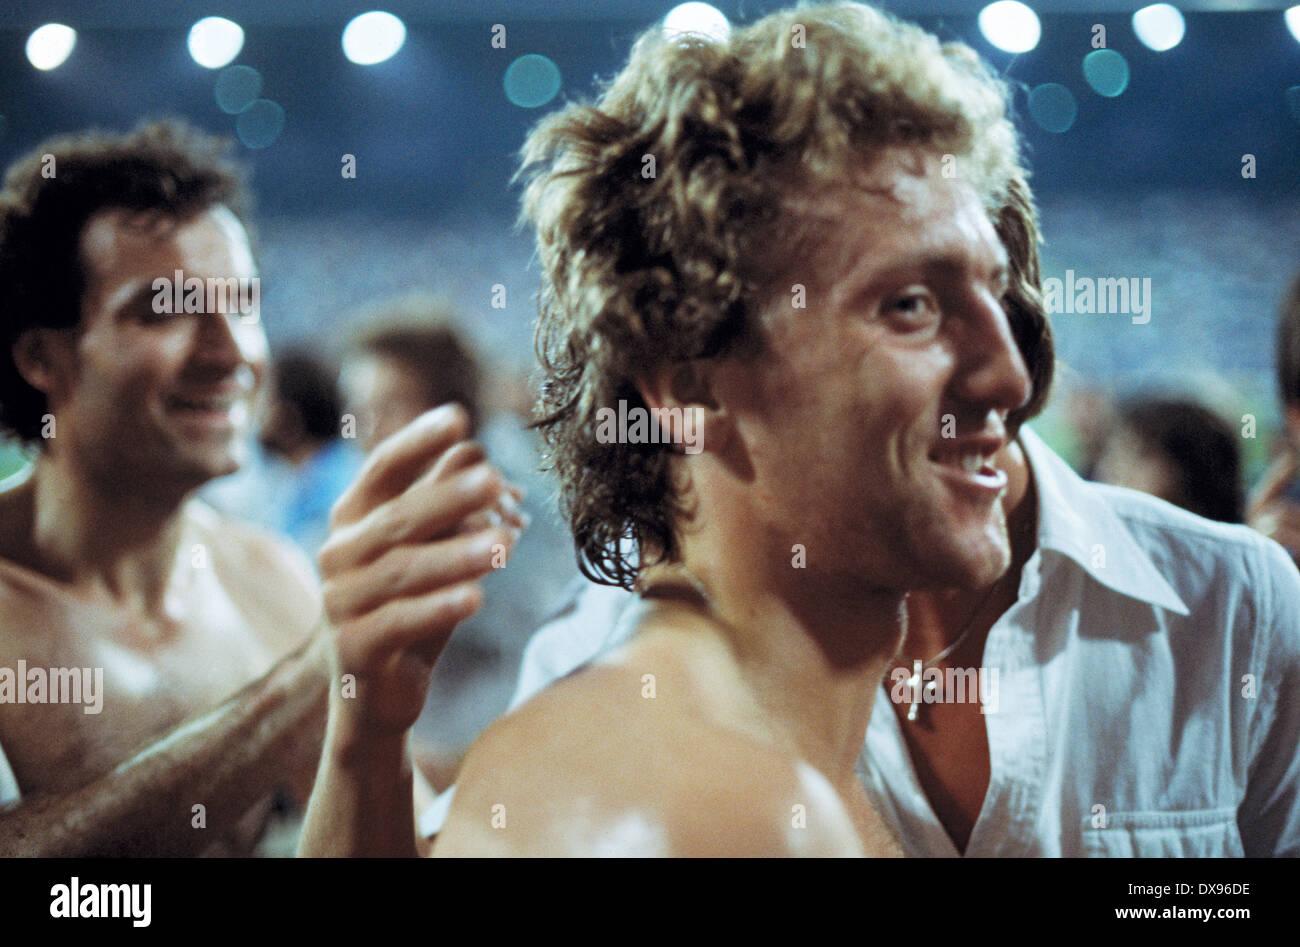 football, 2. Bundesliga Nord, 2. Bundesliga Sued, 1978/1979, relegation match to Bundesliga 1979/1980, return leg, Grotenburg Stadium in Krefeld, FC Bayer 05 Uerdingen versus SpVgg Bayreuth 2:1, promotion celebration Bayer, Hans-Peter Mentzel - Stock Image